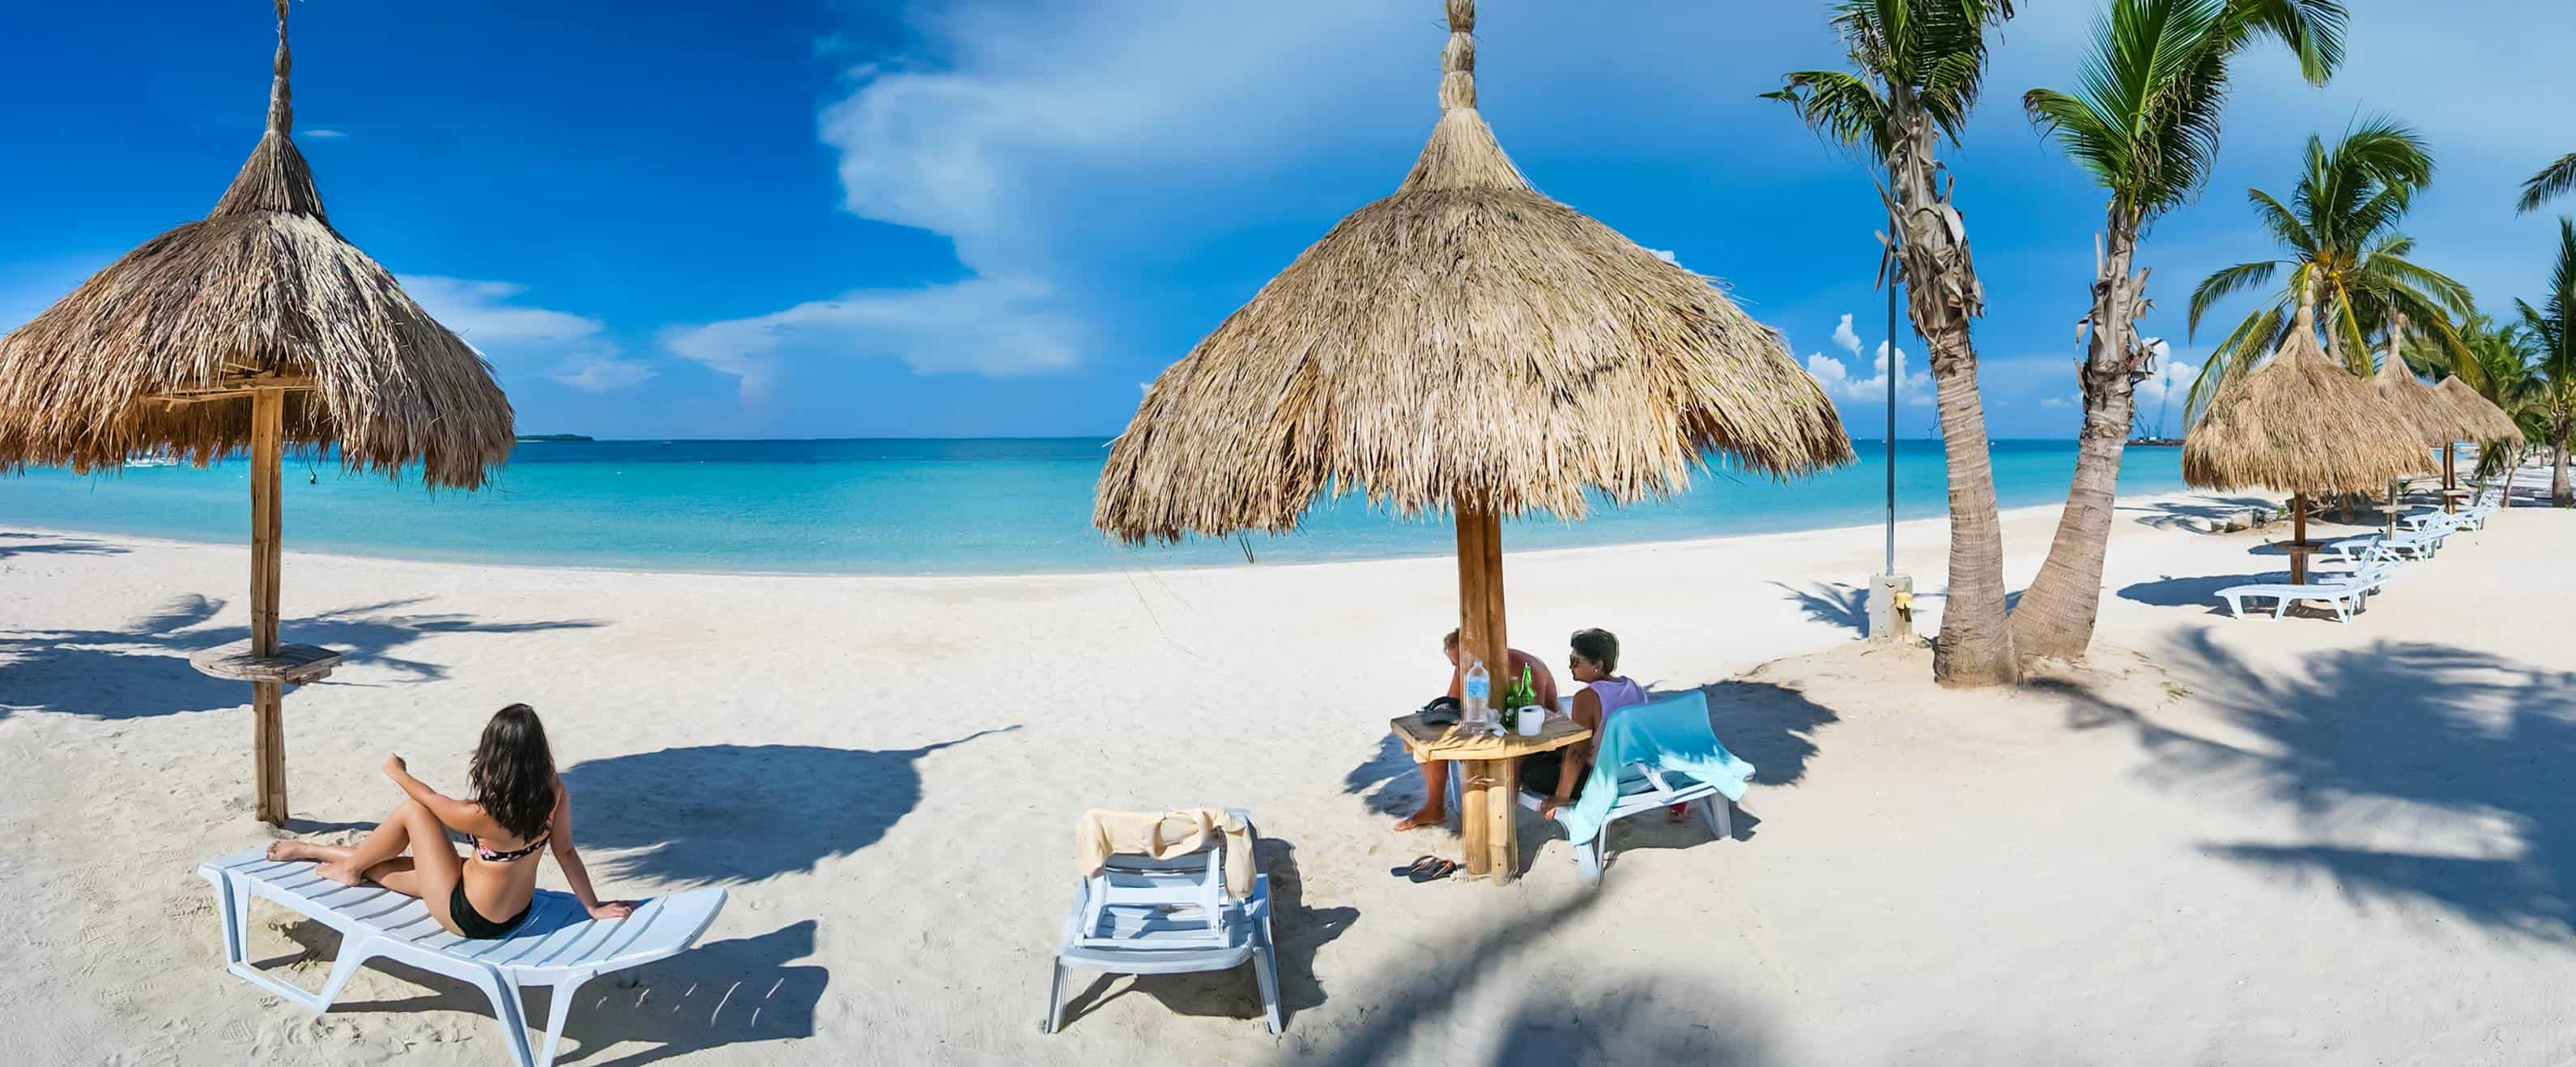 Beach Placid Resort Bantayan Cebu (2)